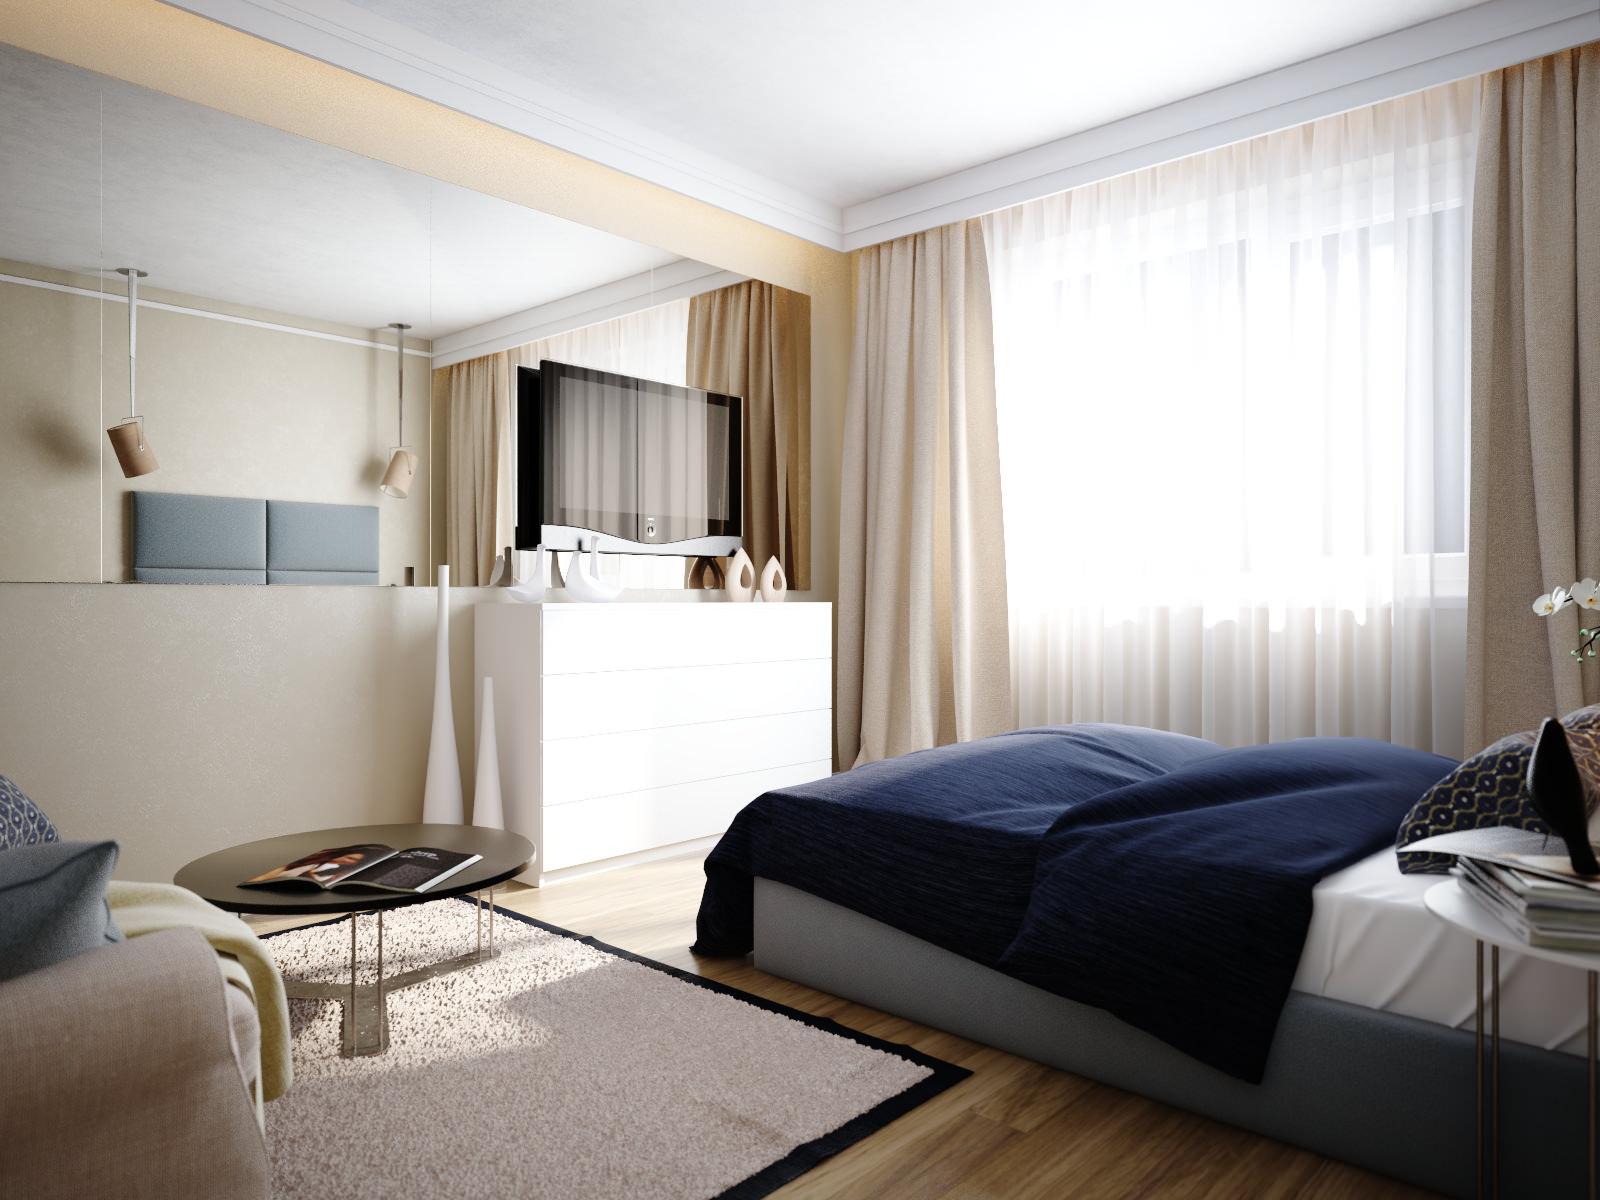 Квартира 30 квм в барселоне купить недорого